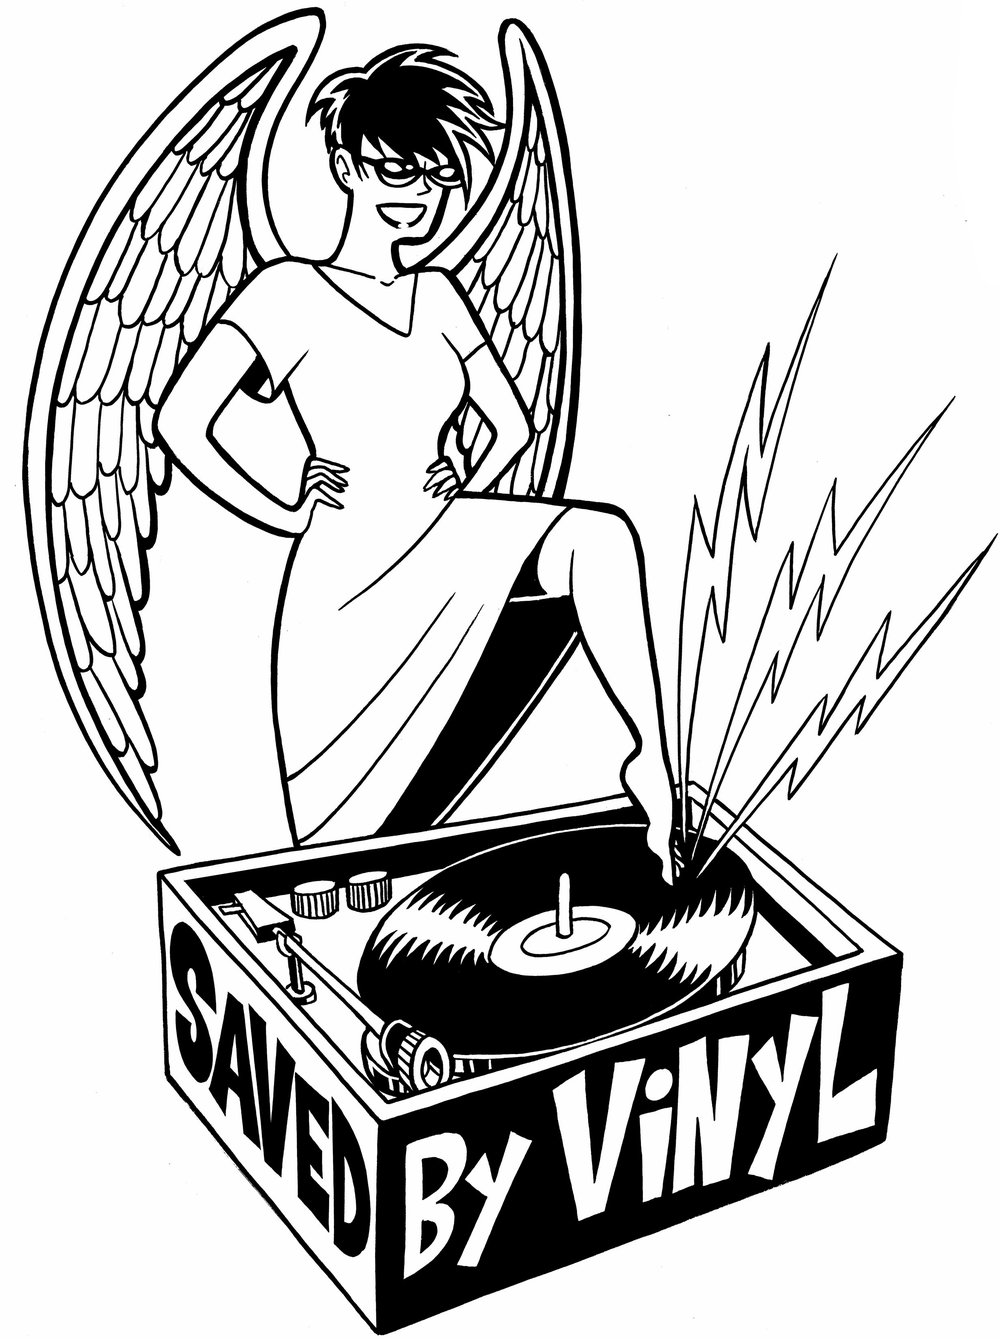 Saved by Vinyl